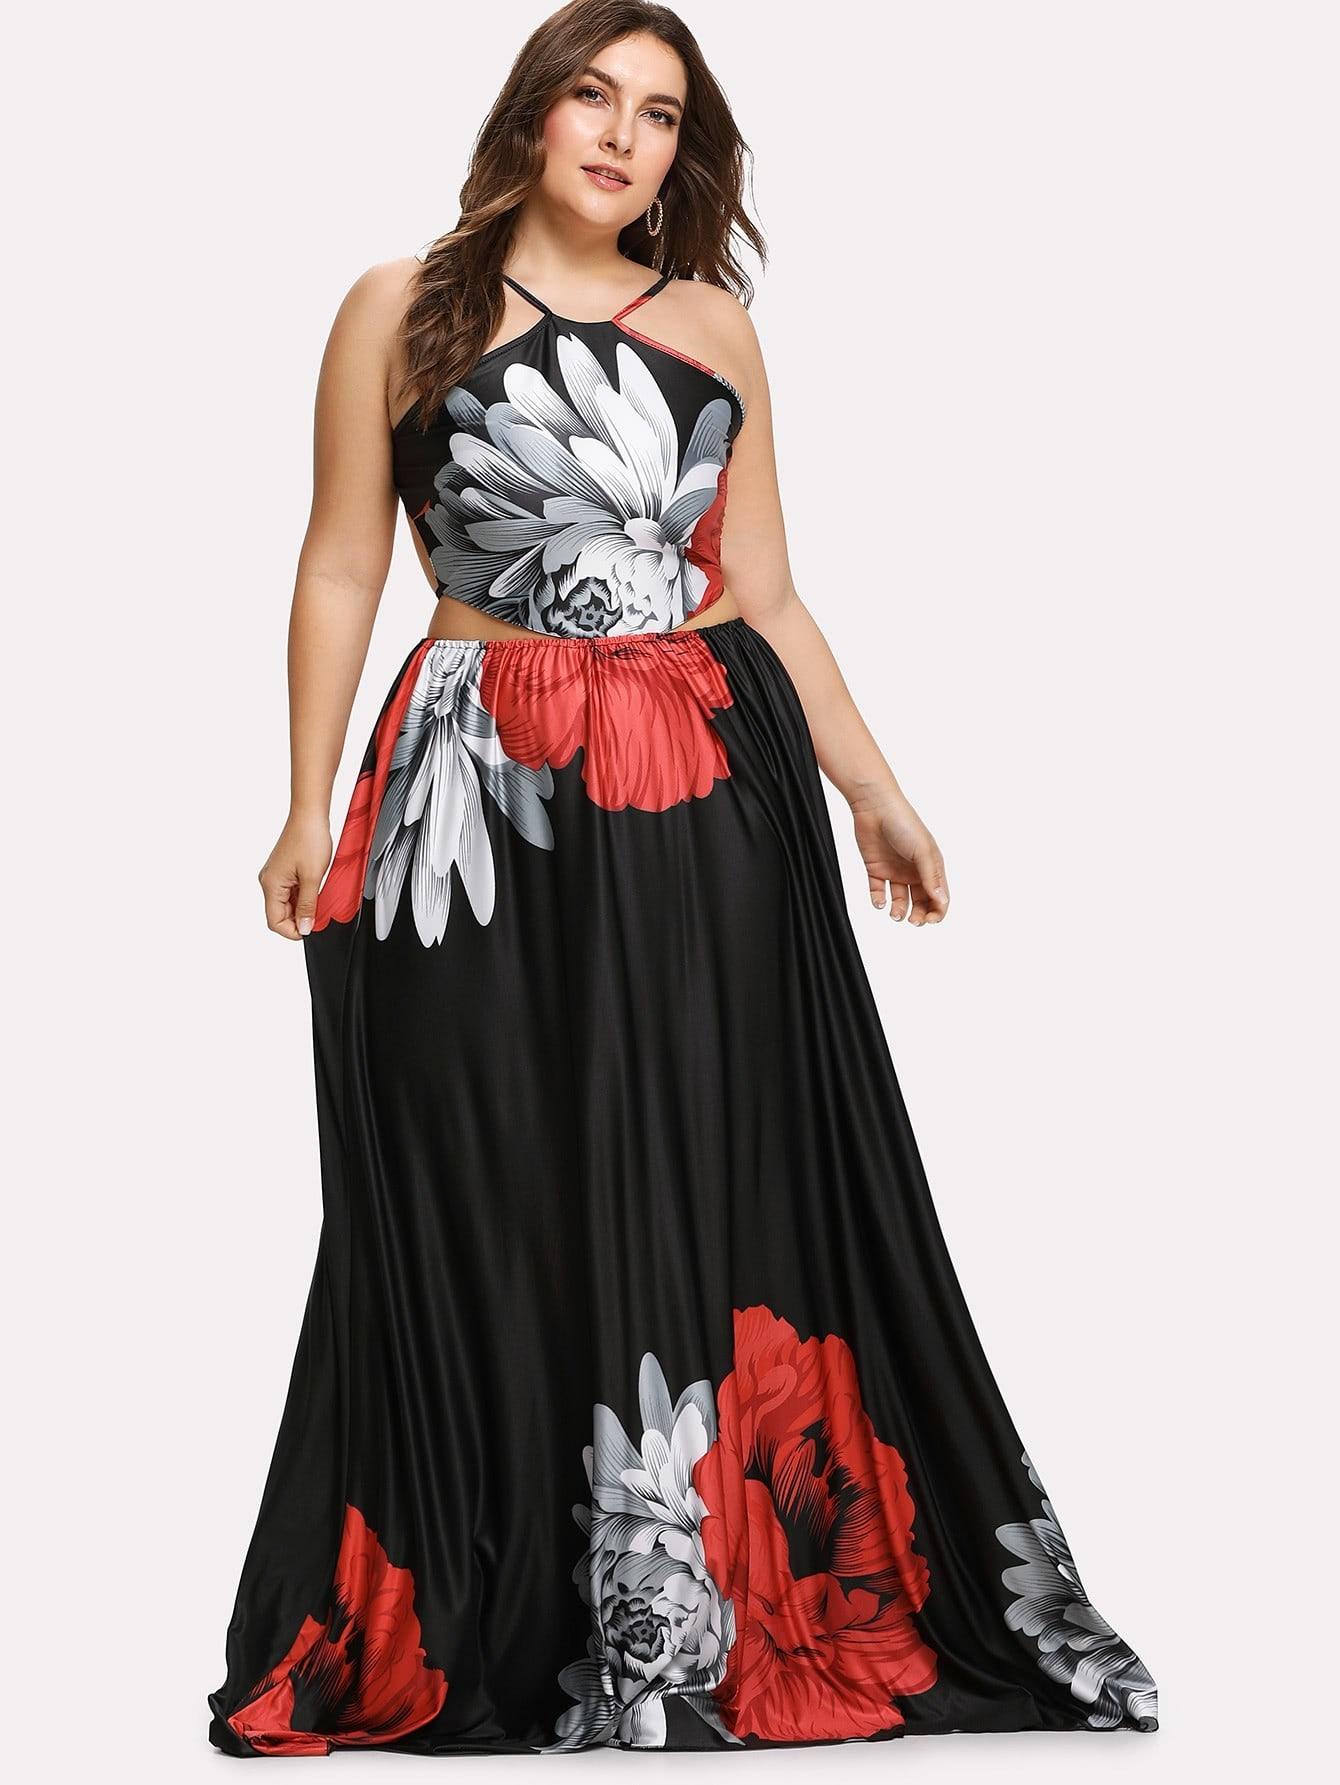 Flower Print Lace Up Backless Dress butterfly print lace up slip dress